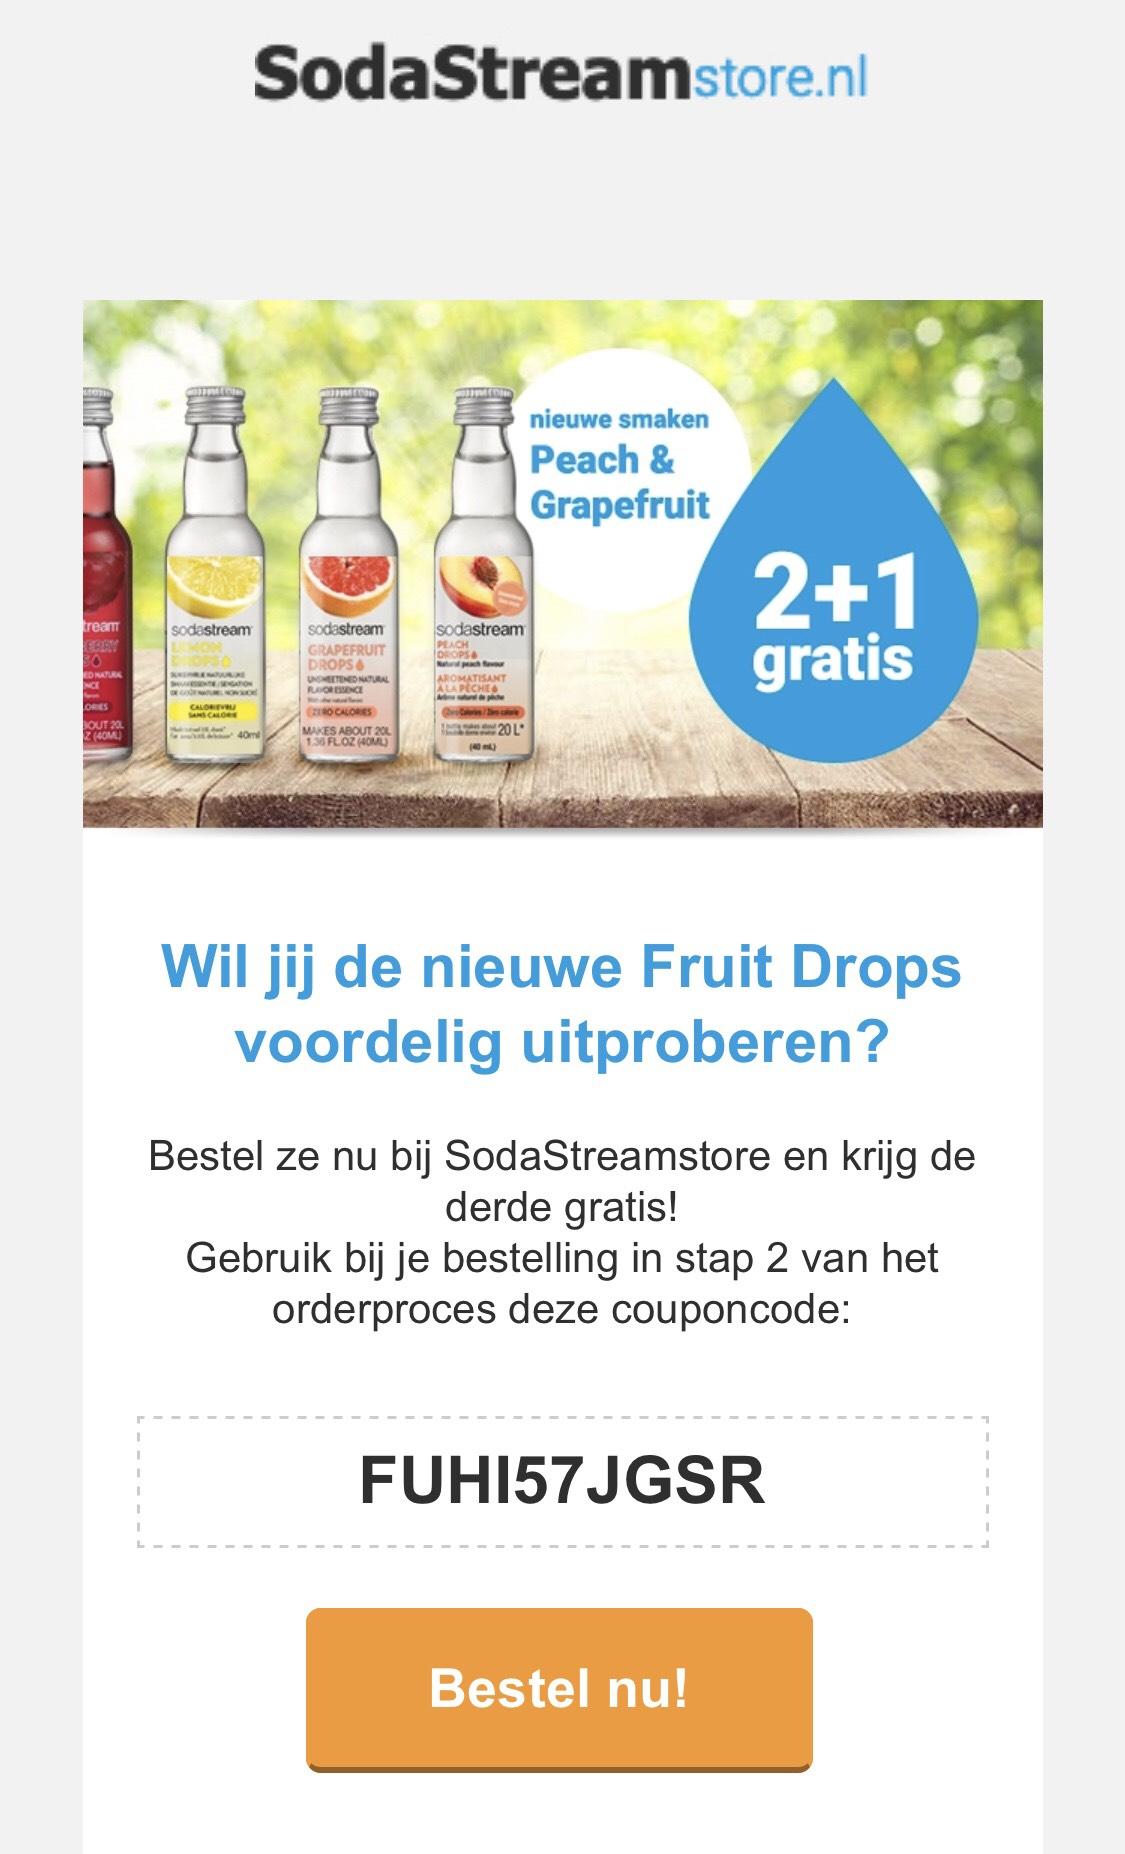 SodaStream siropen 2+1 gratis